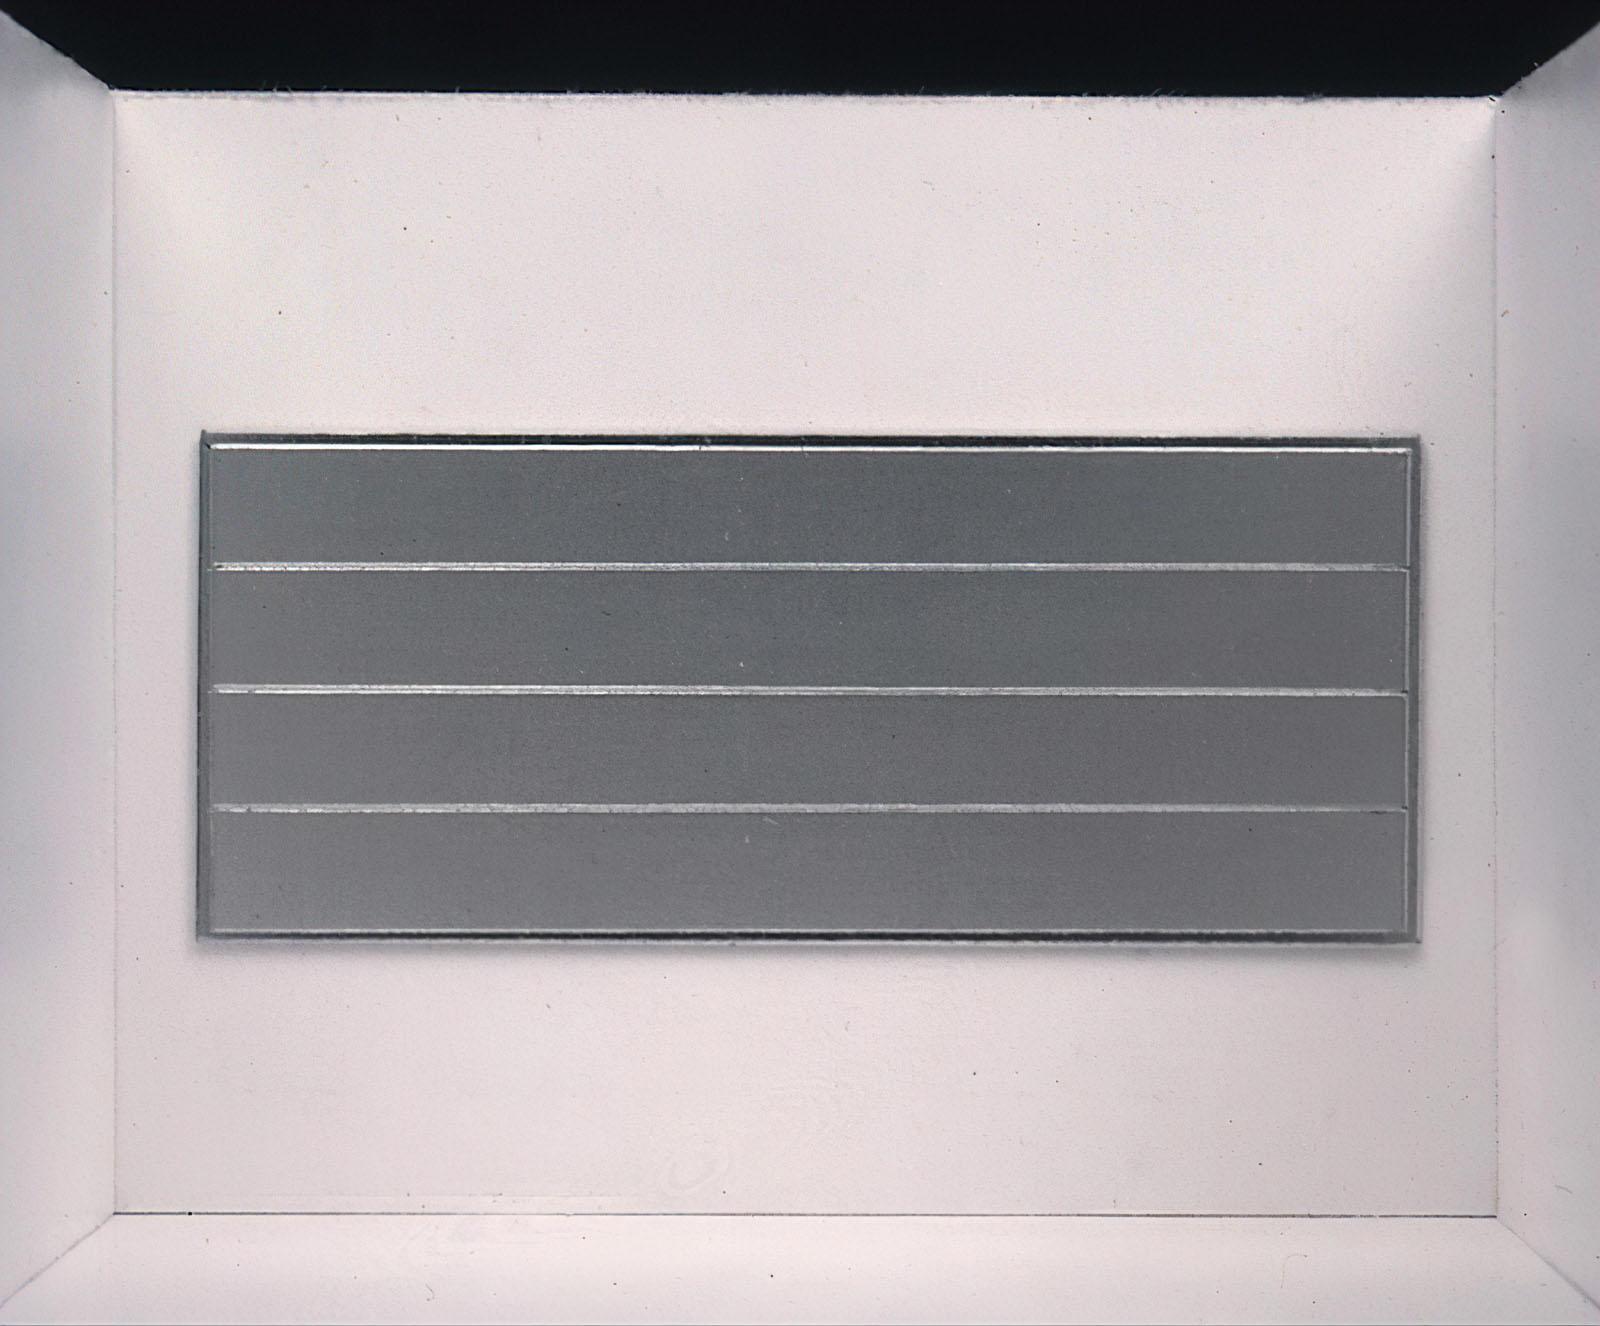 Tadaaki Kuwayama - Untitled